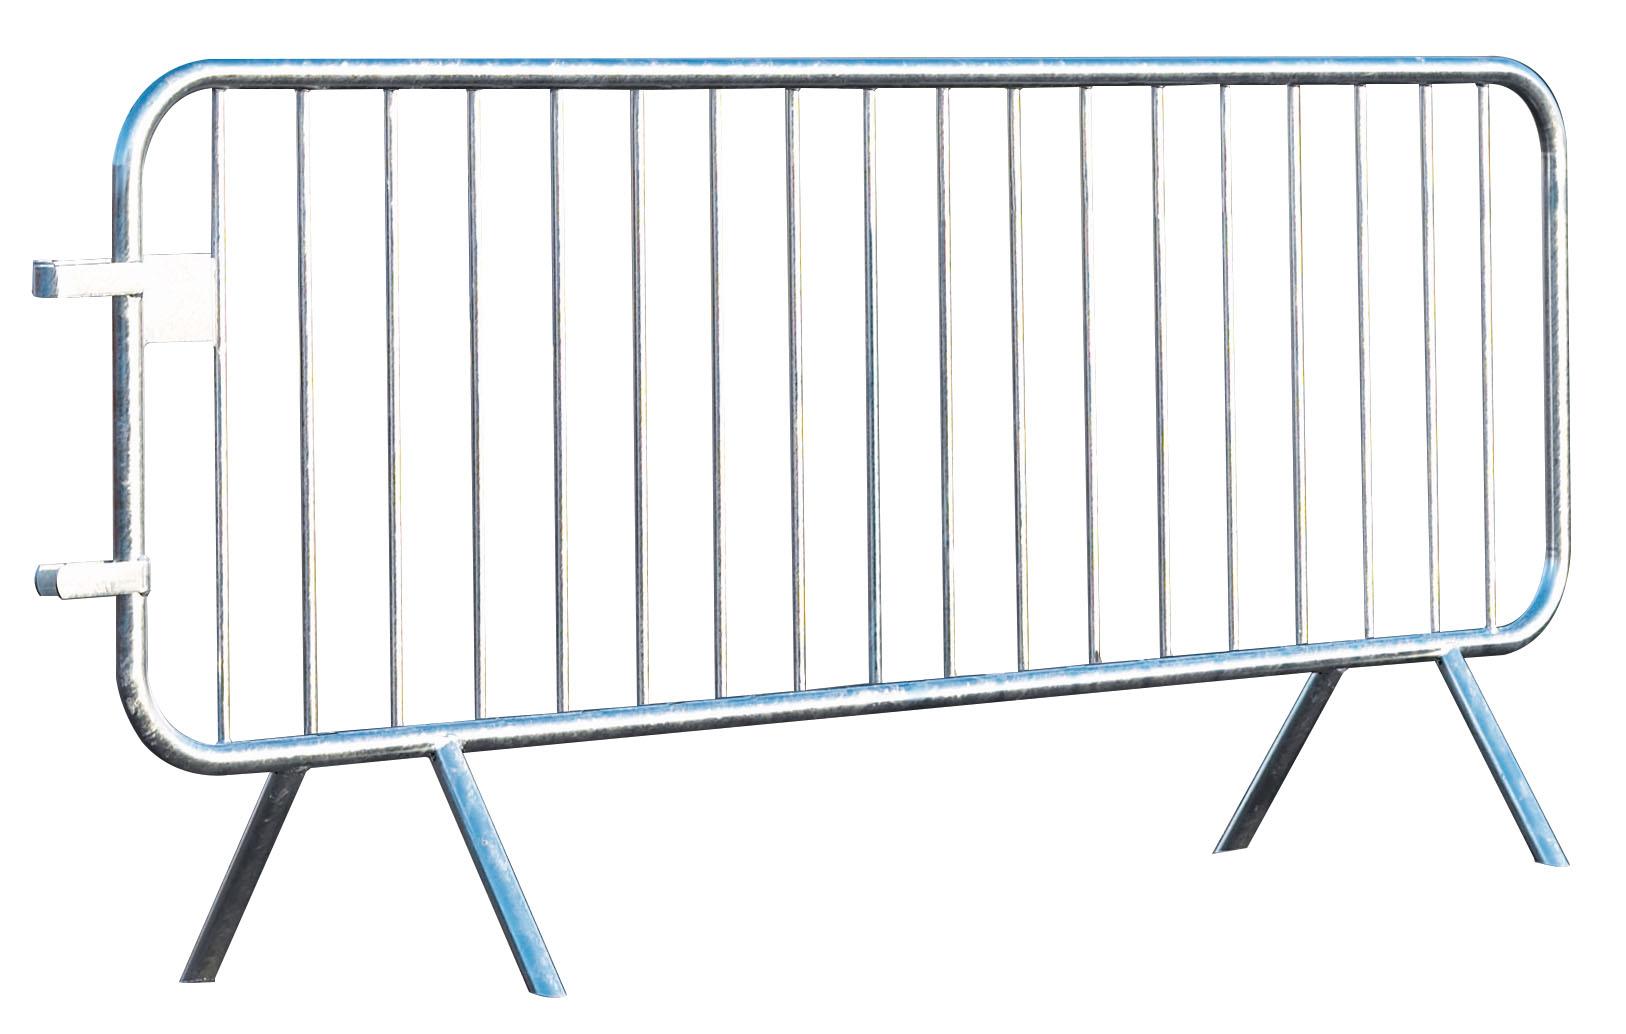 Mobiles Absperrgitter Ecobar® Aus Stahl